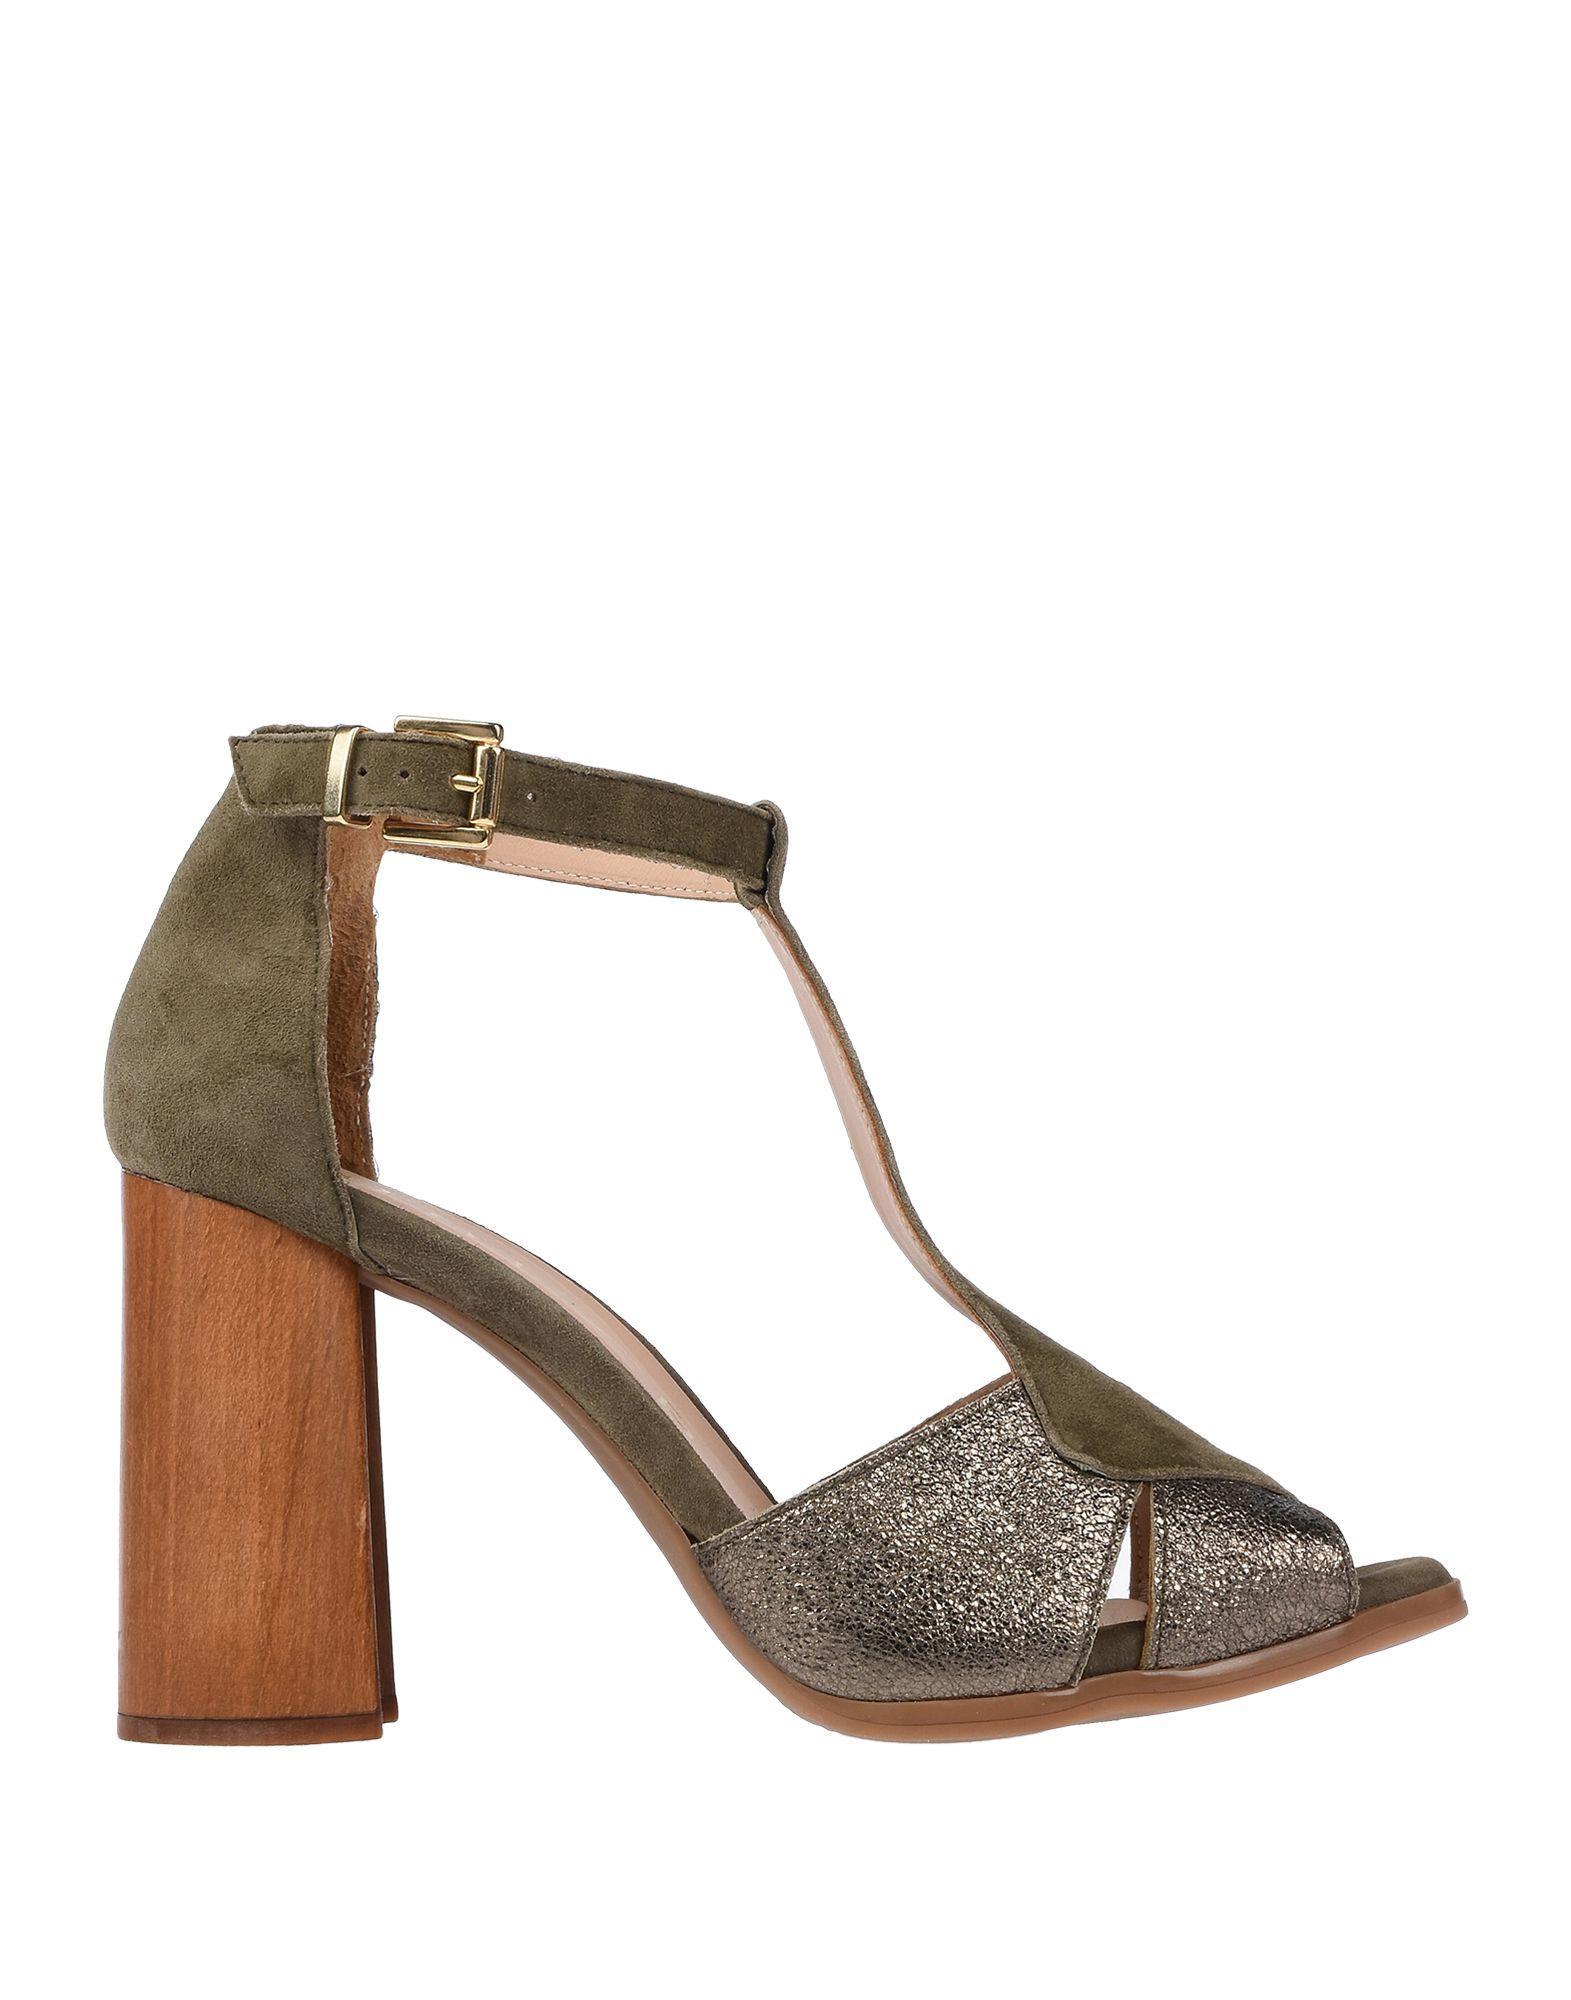 672bd788d6 Unisa Sandals in Green - Lyst